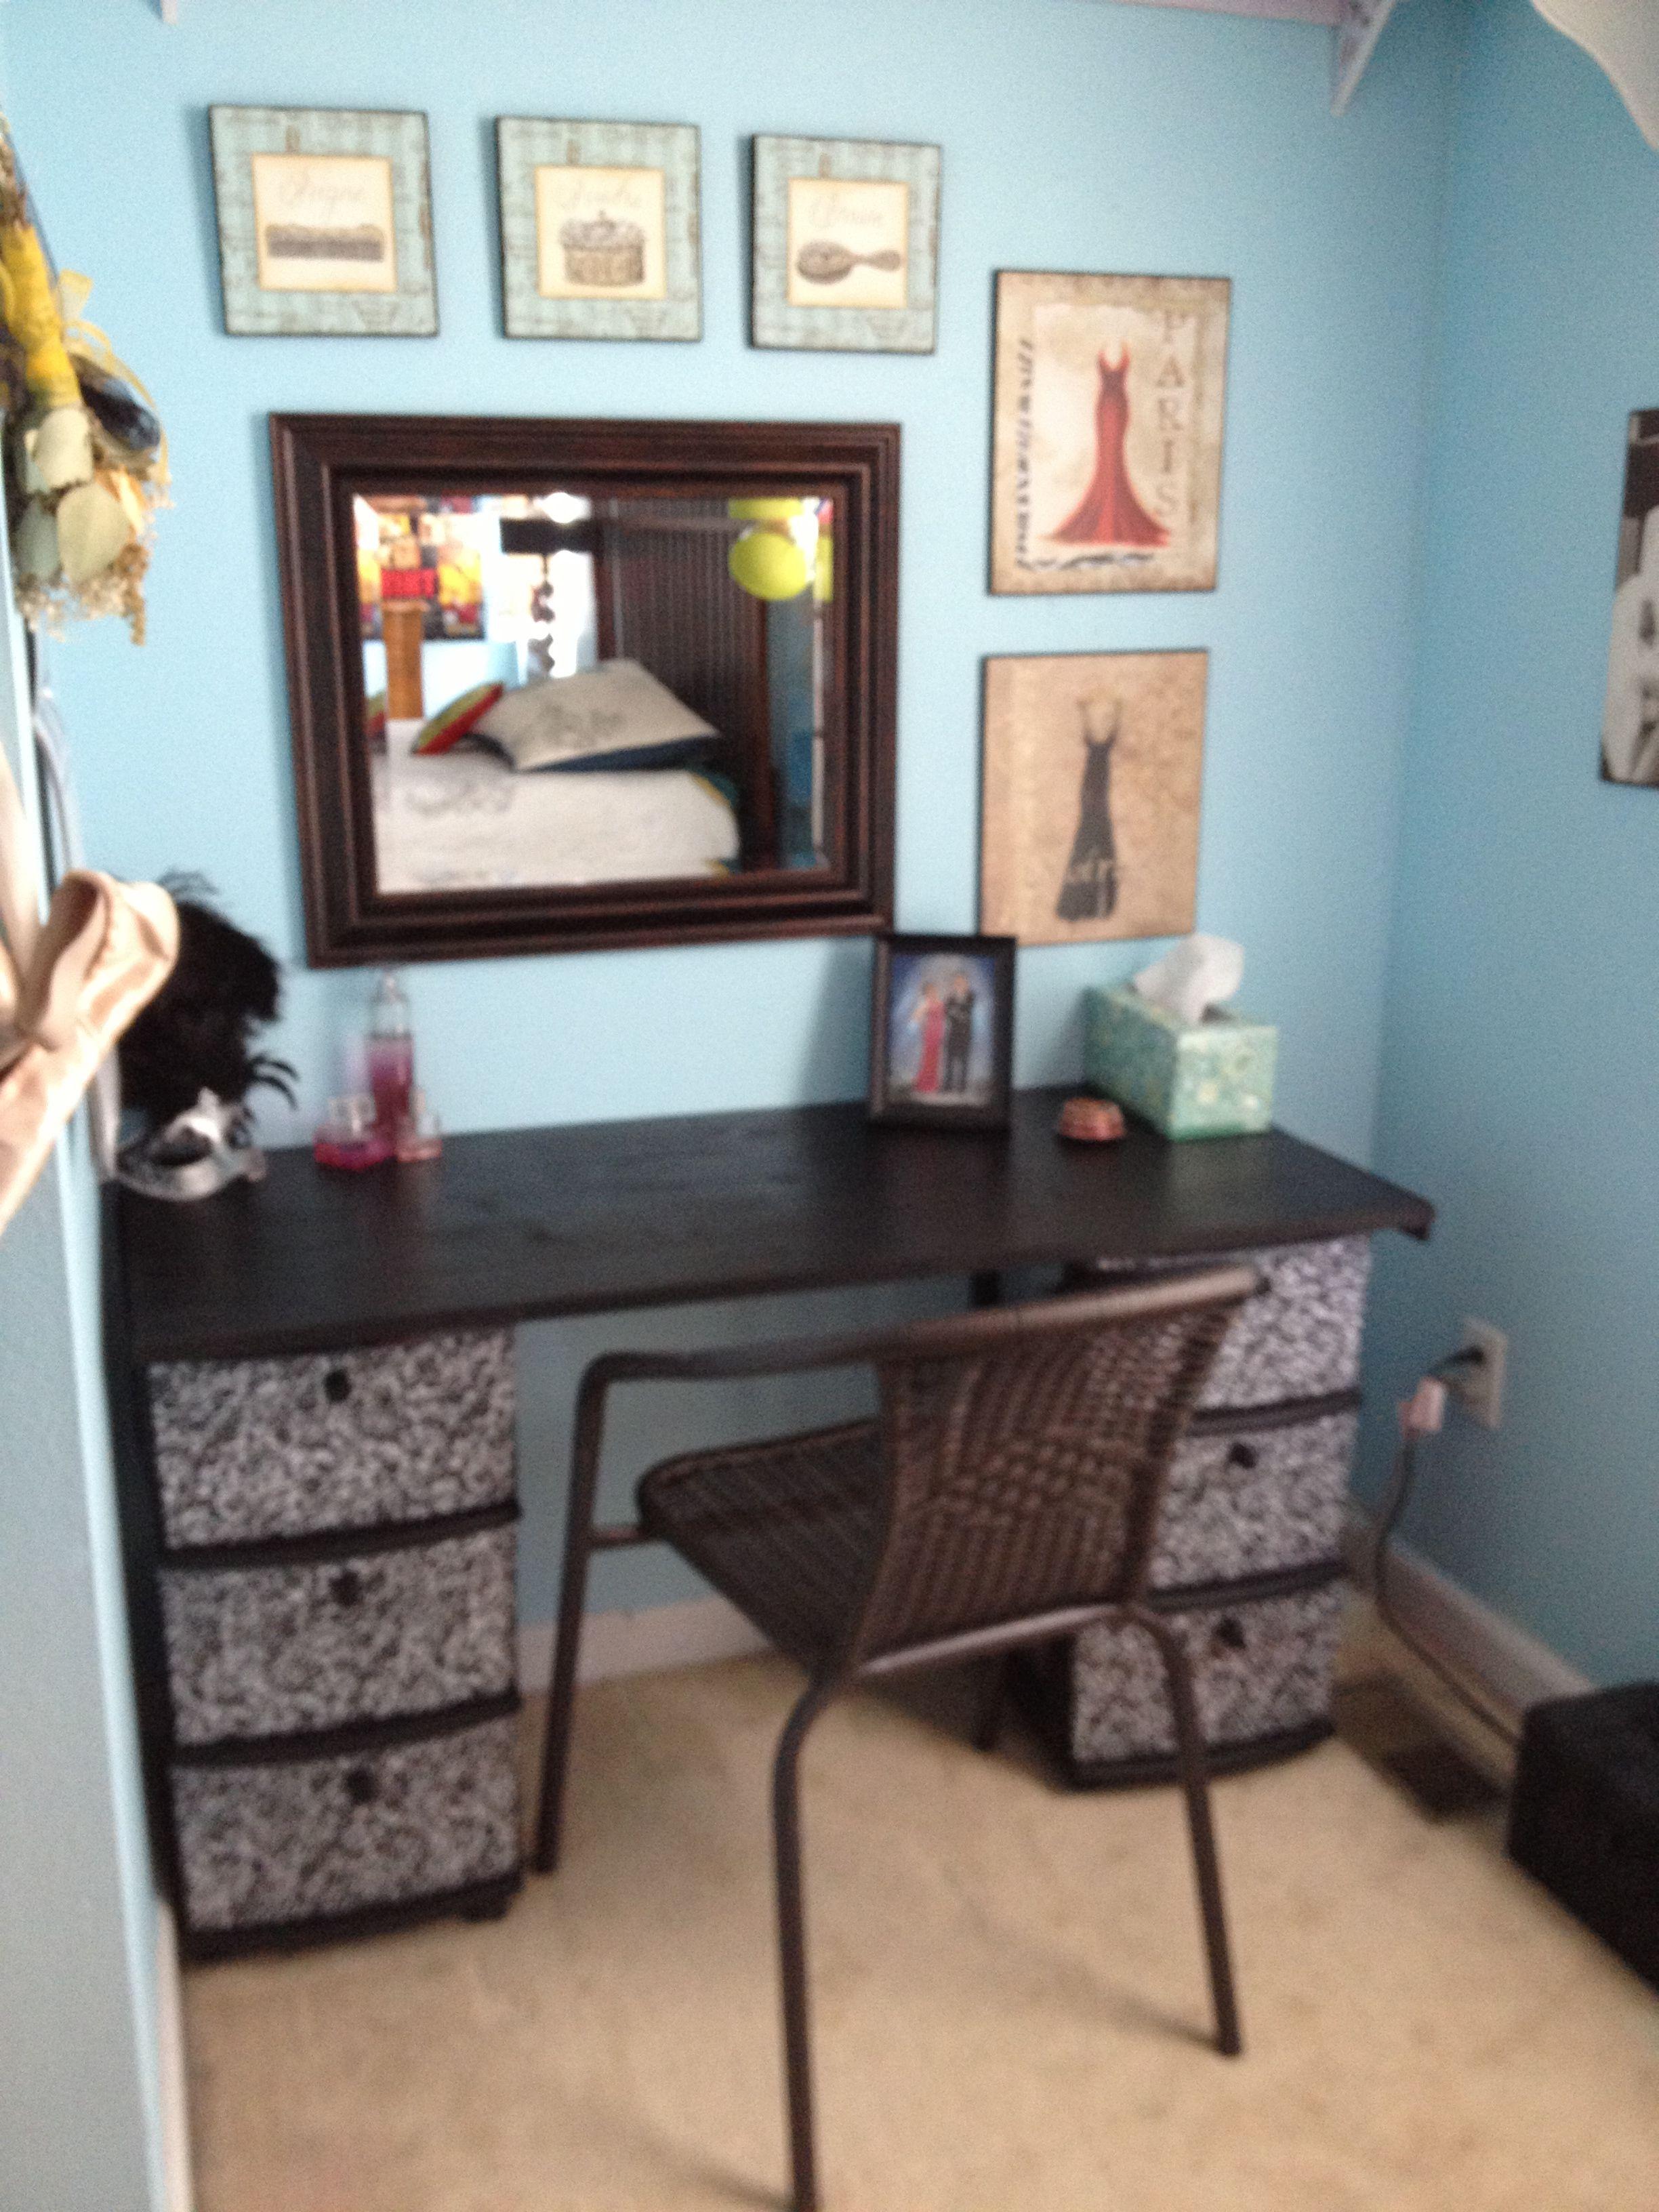 DIY makeup table Home stuff Beauty room decor, Cool